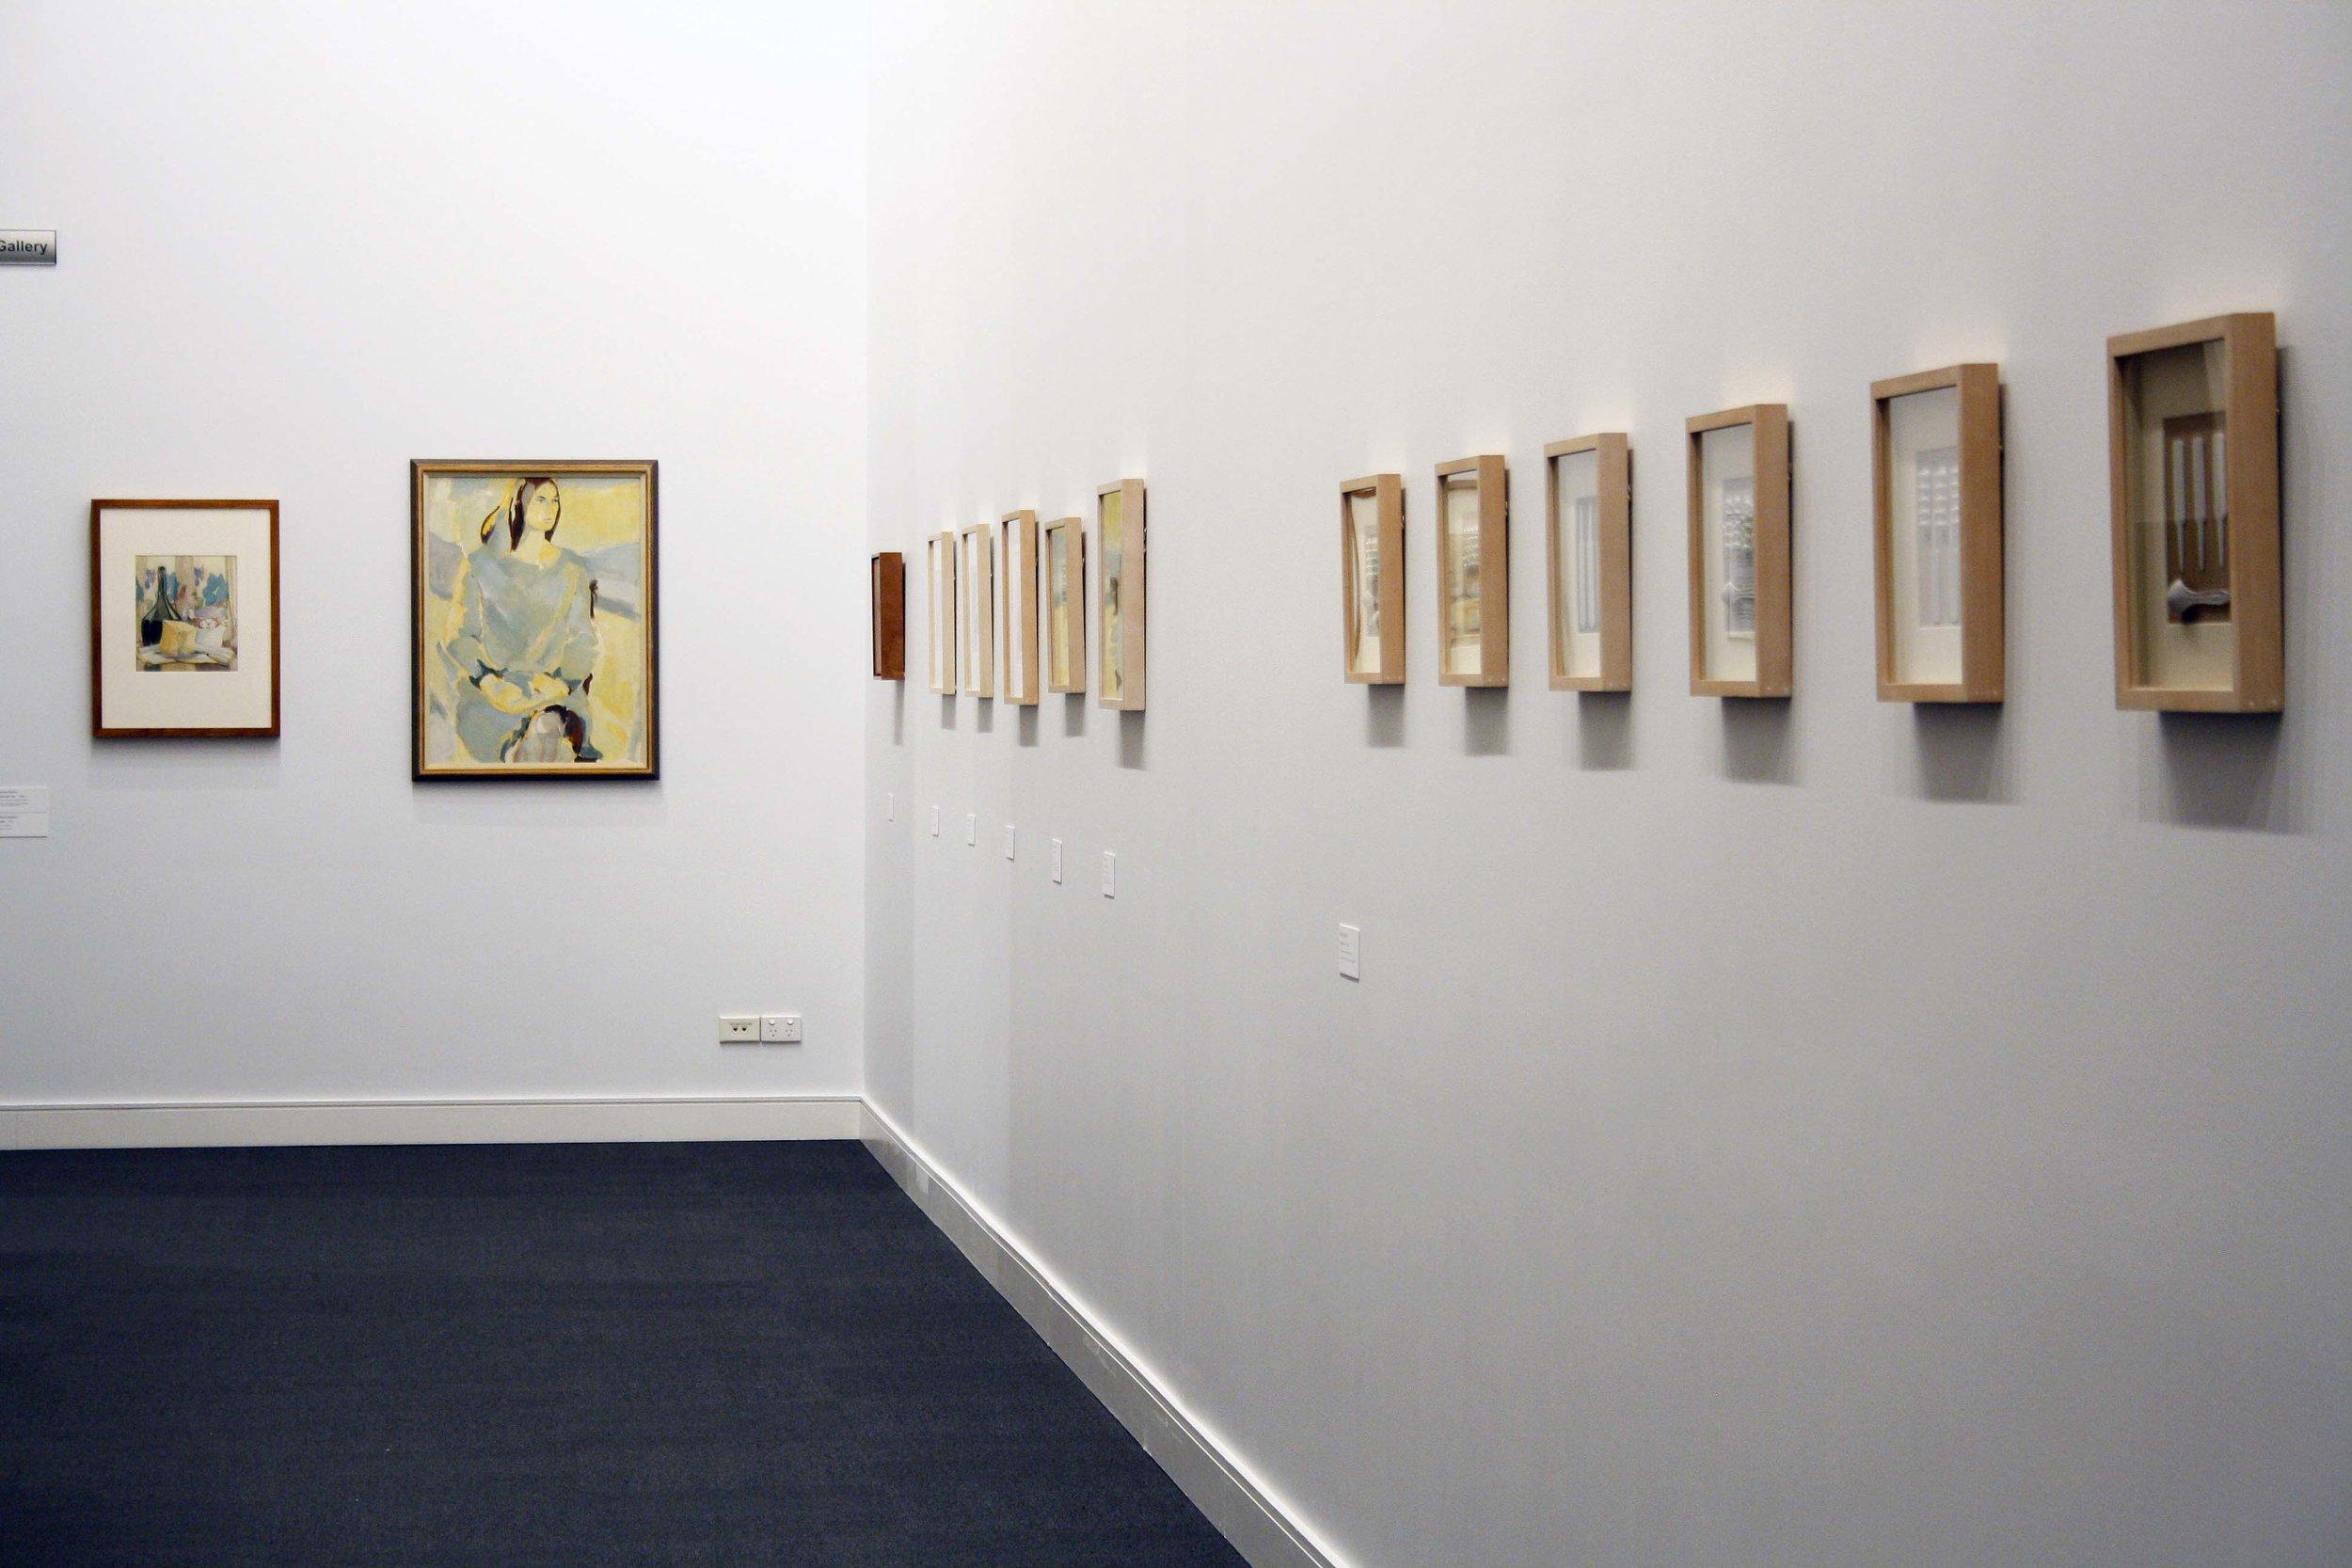 'Madonna Staunton: Selected works' Jun. - Aug. 2012